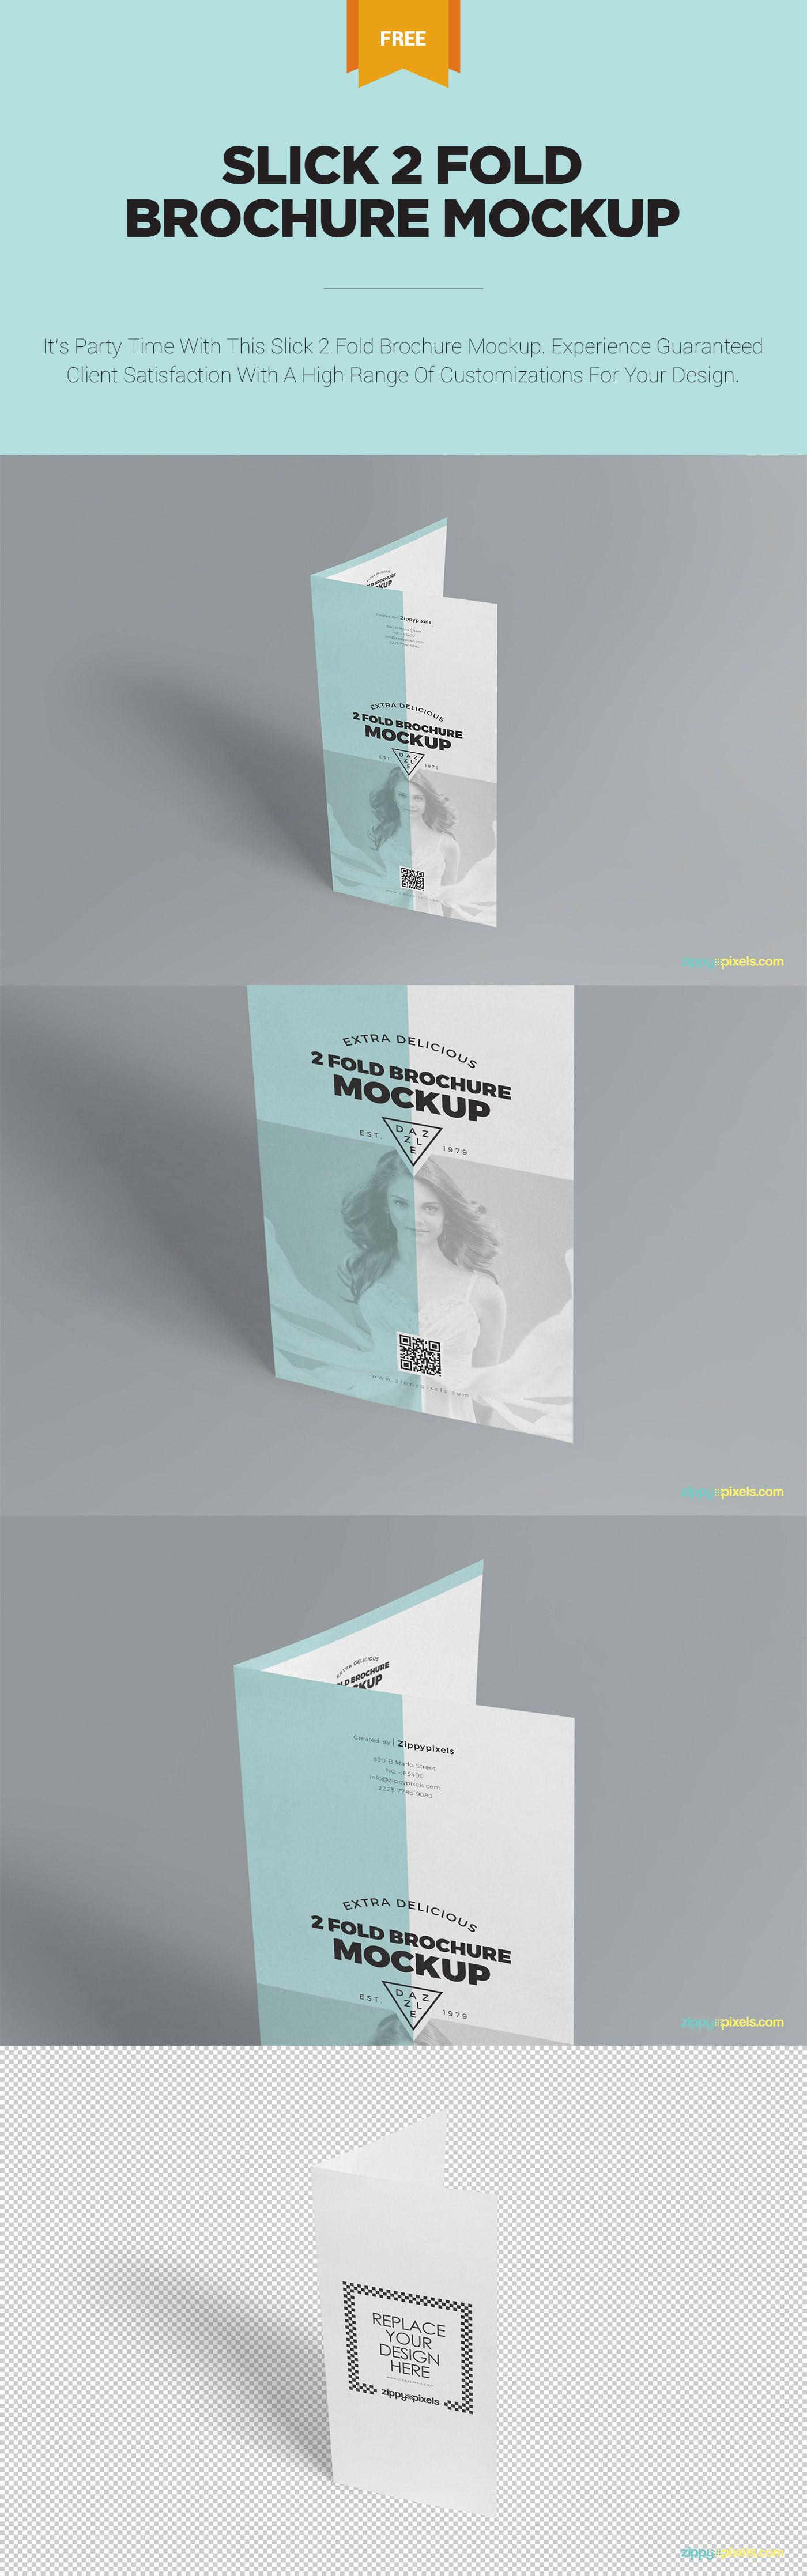 Slick Free 2 Fold Brochure Mockup Psd Zippypixels Brochure Mockup Psd Mockup Psd Brochure